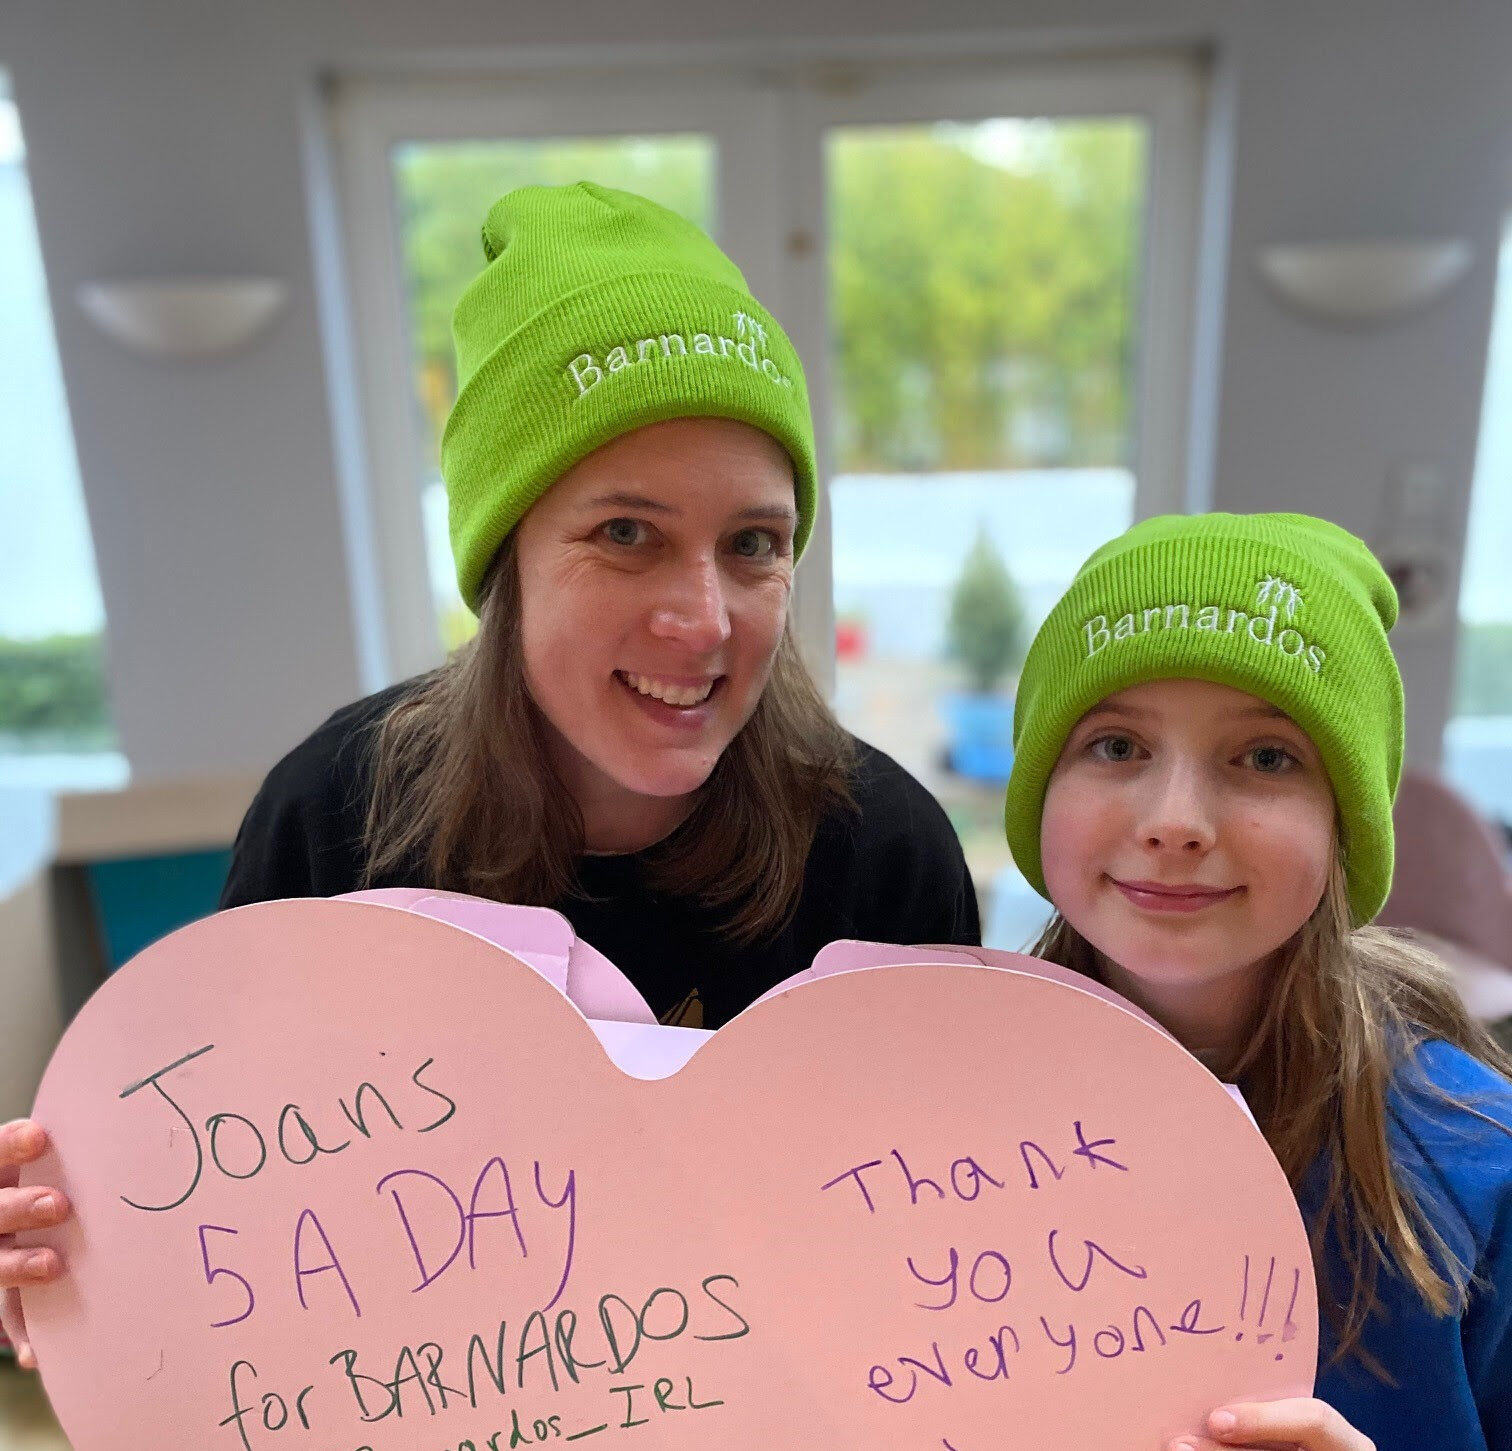 Barnardos Celebrate Joans 5 a Day